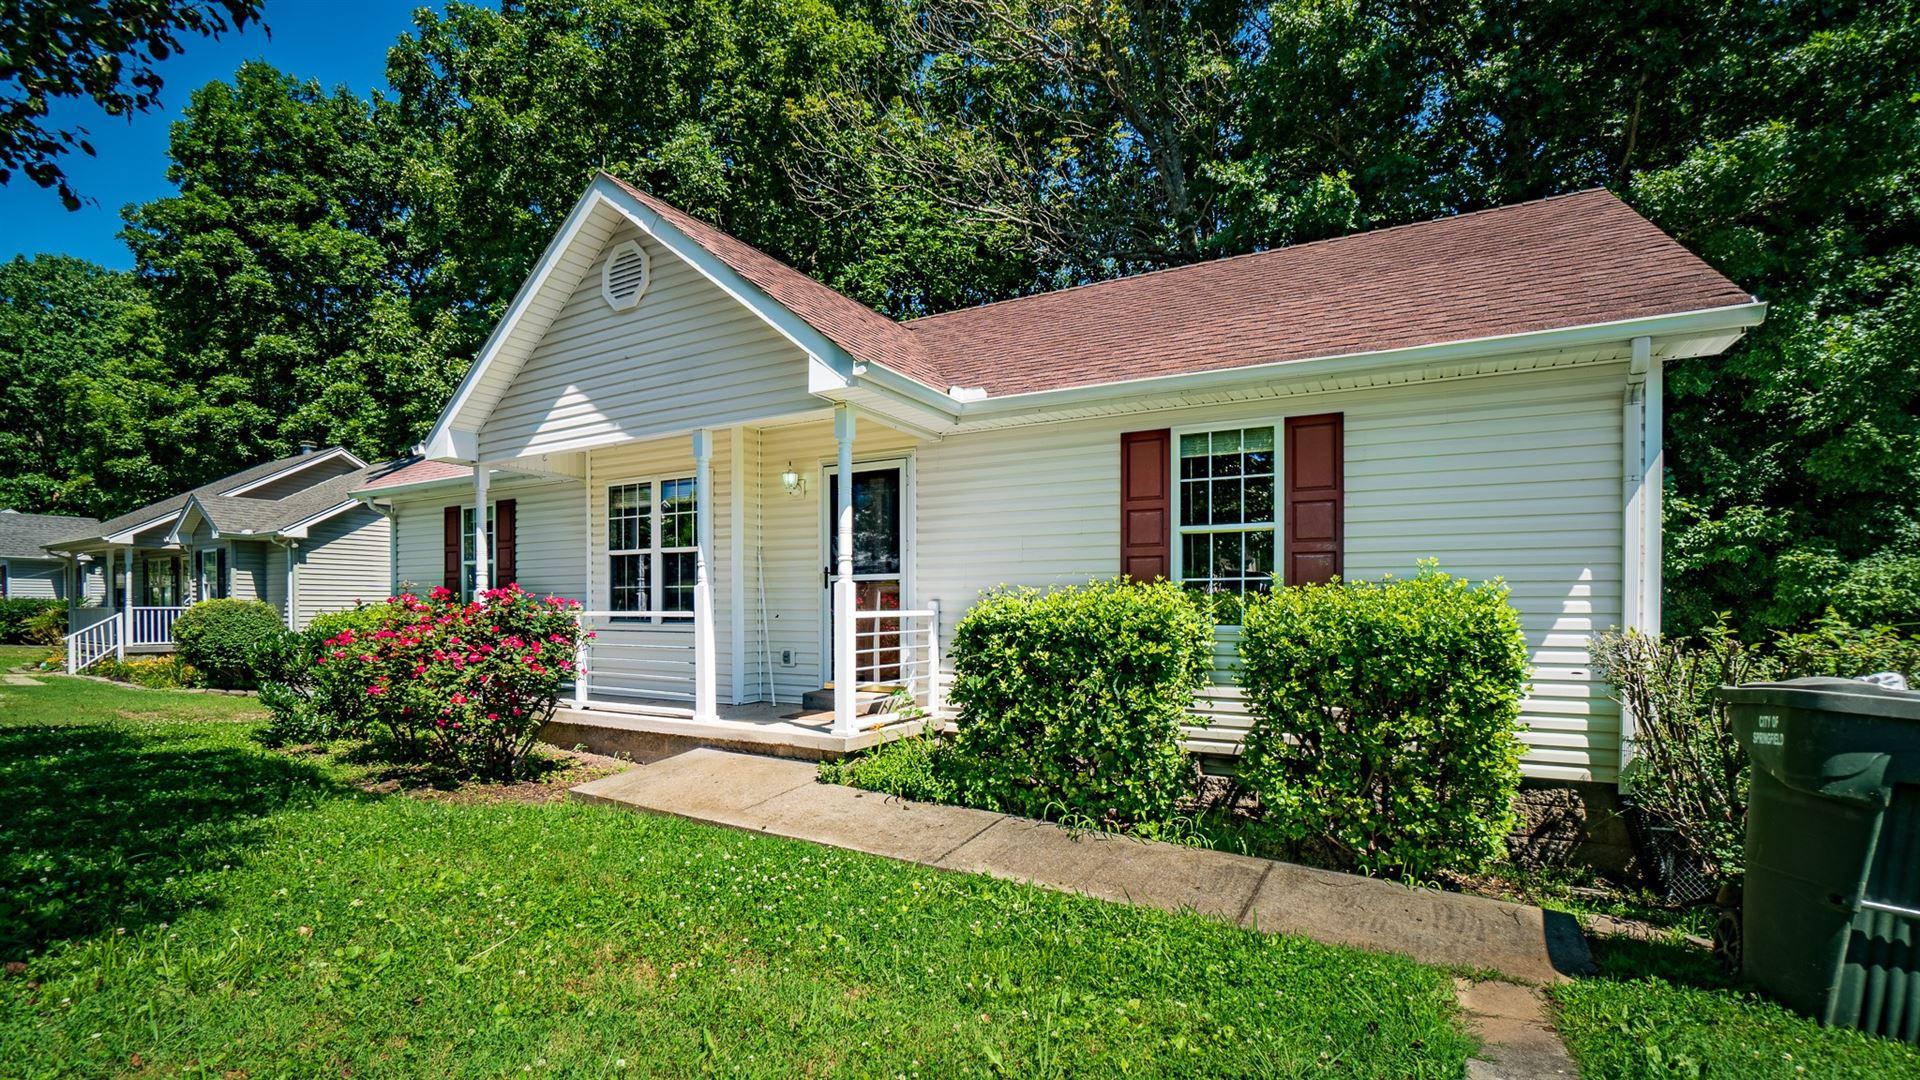 137 Brookside Pt, Springfield, TN 37172 - MLS#: 2262640